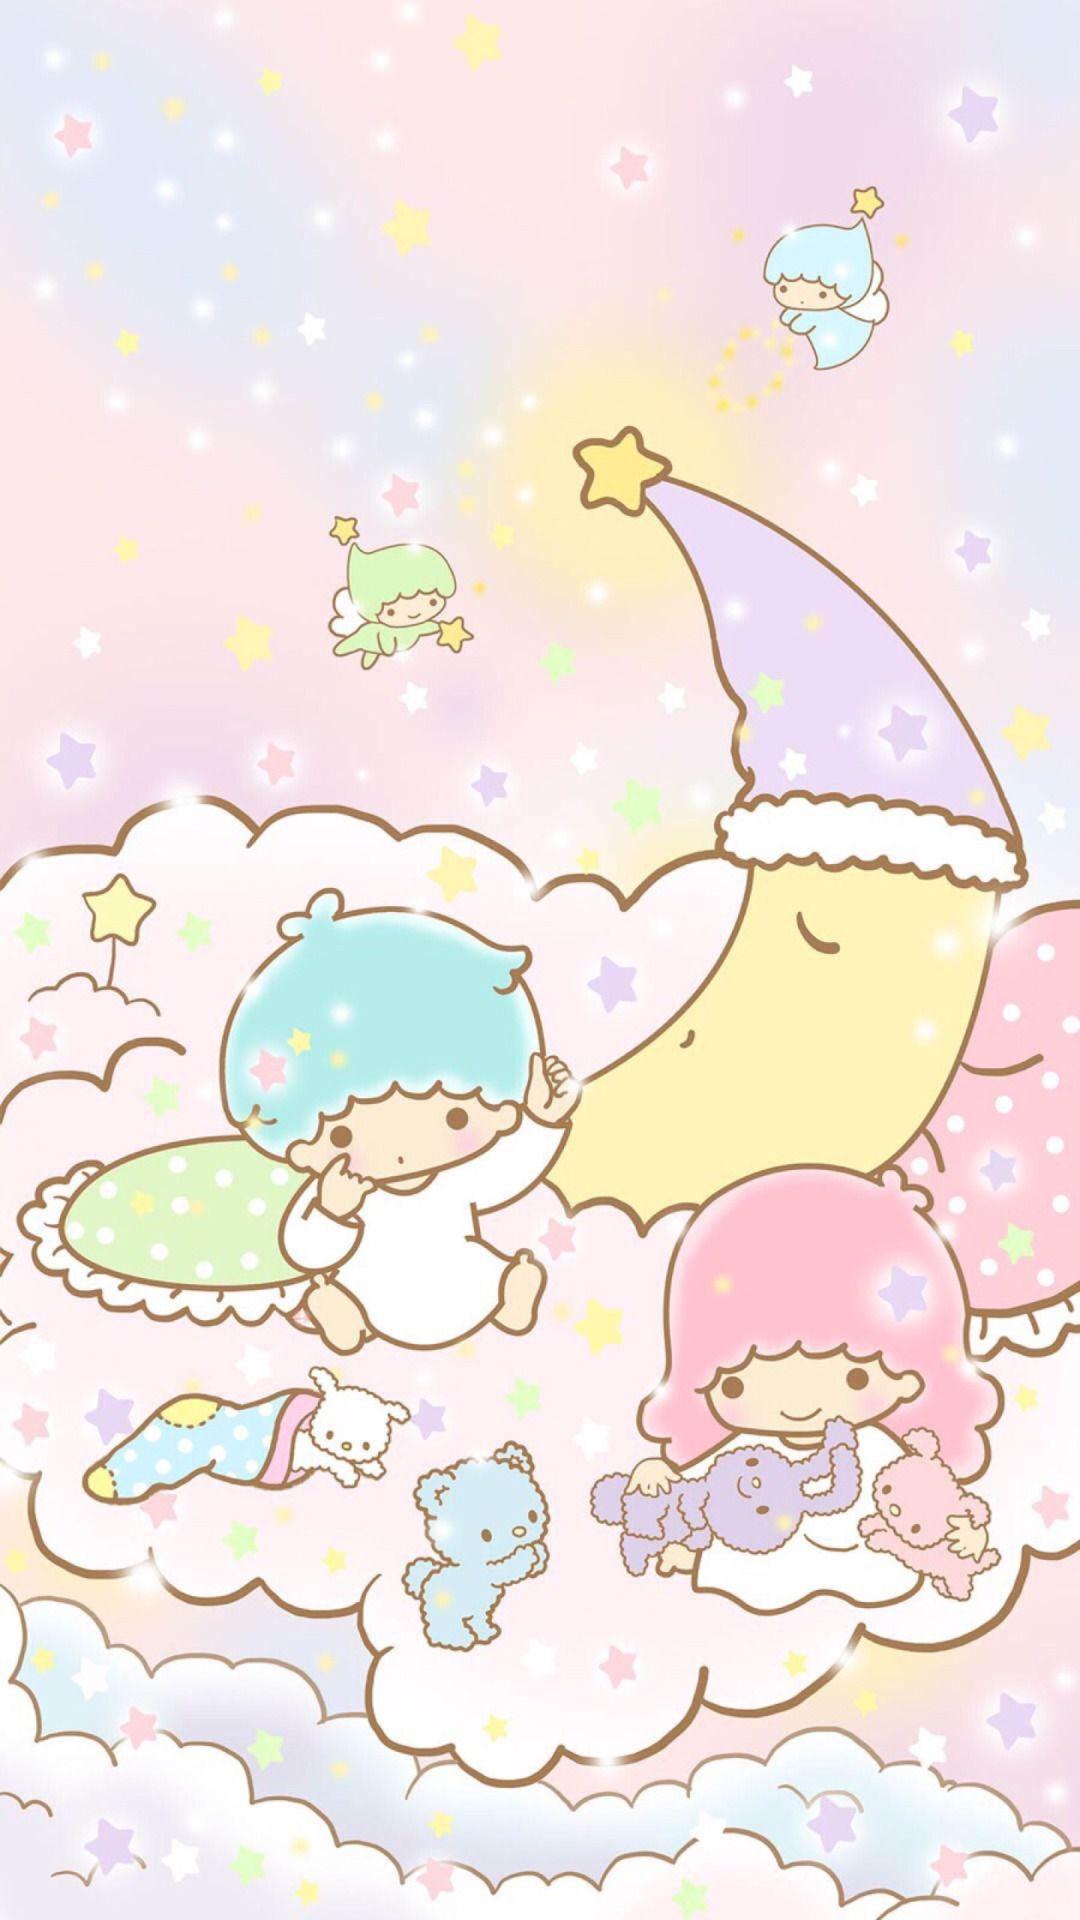 Iphone 11 Little Twin Stars 1080x1920 Download Hd Wallpaper Wallpapertip